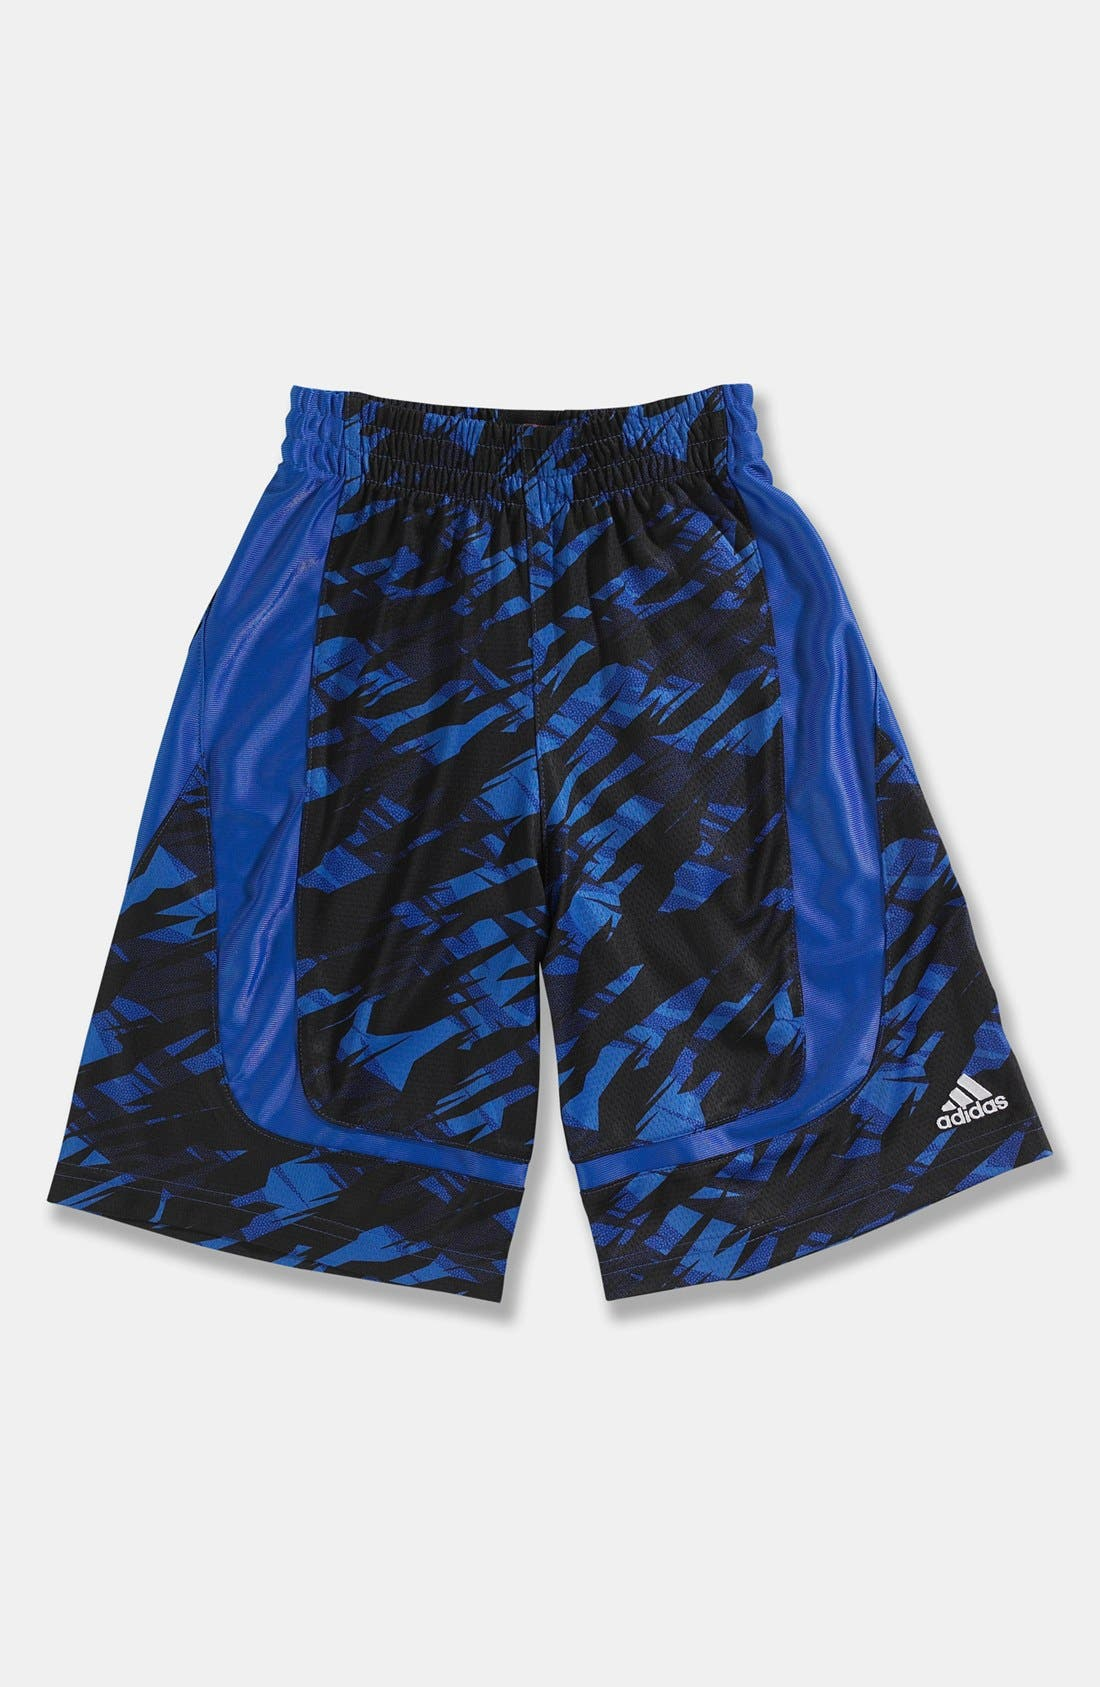 Main Image - adidas 'Impact Camo' Court Shorts (Little Boys)